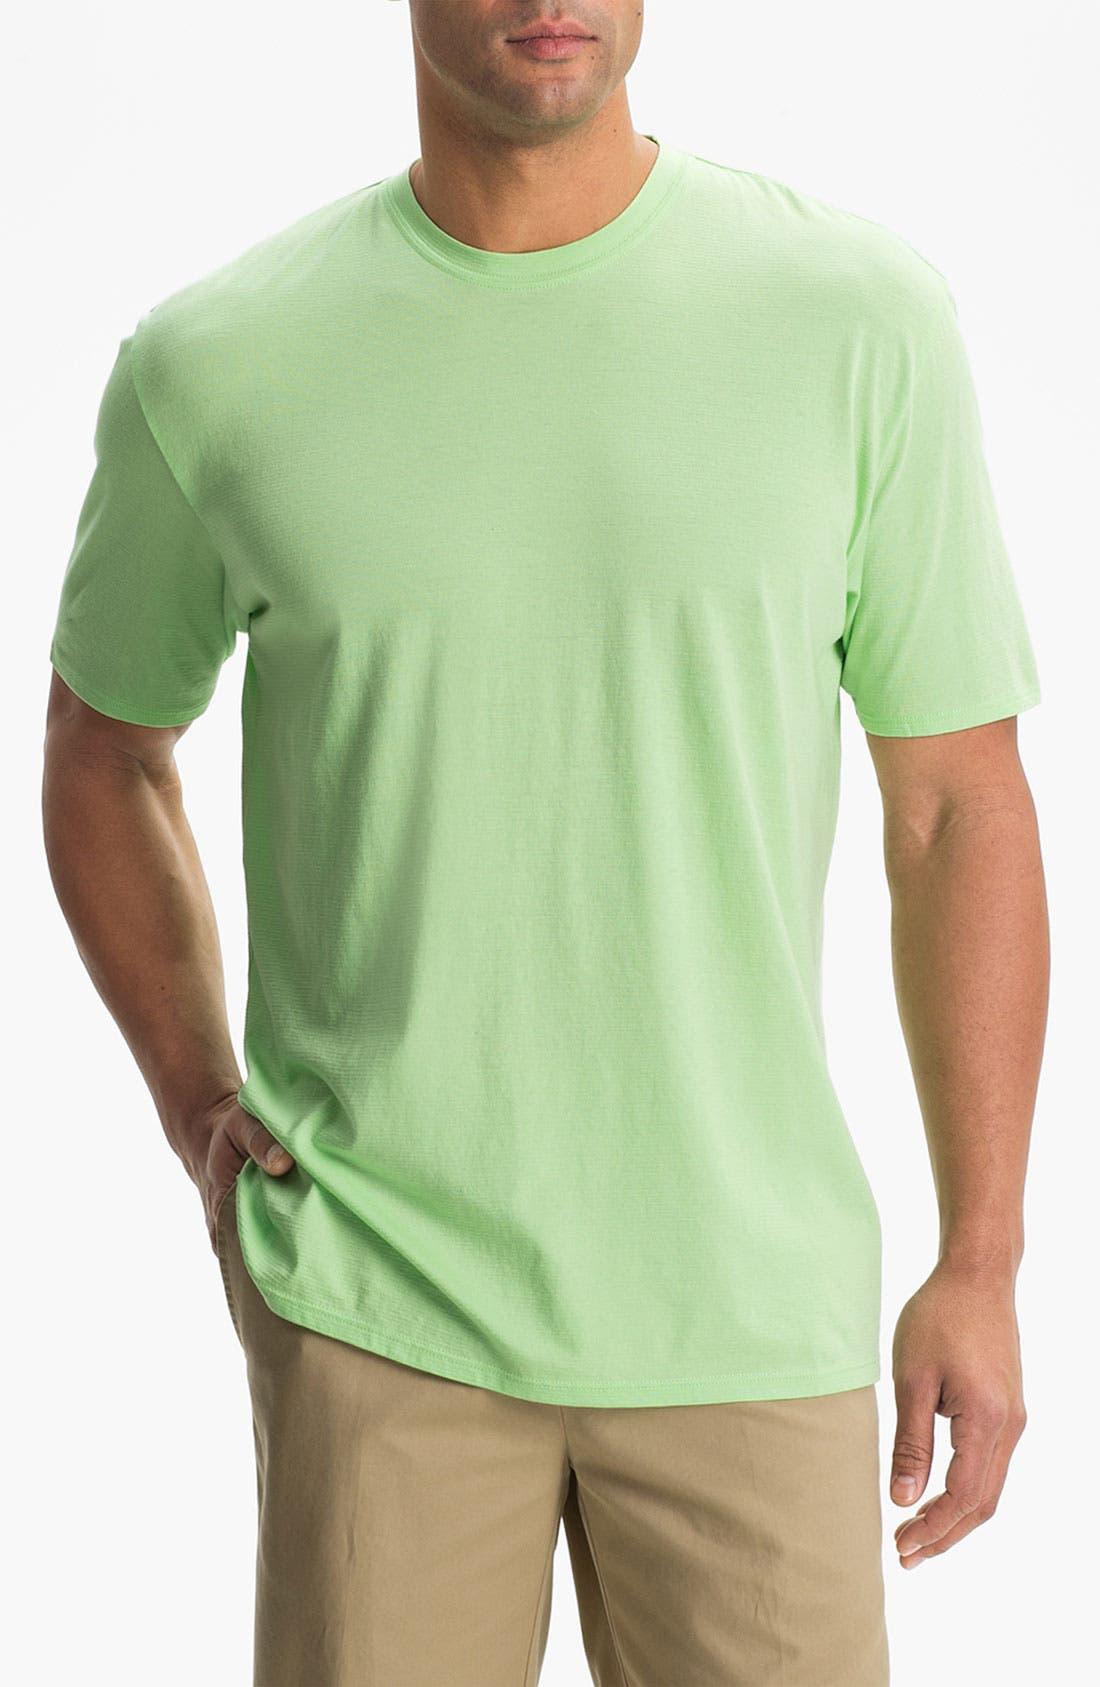 Alternate Image 1 Selected - Cutter & Buck Crewneck T-Shirt